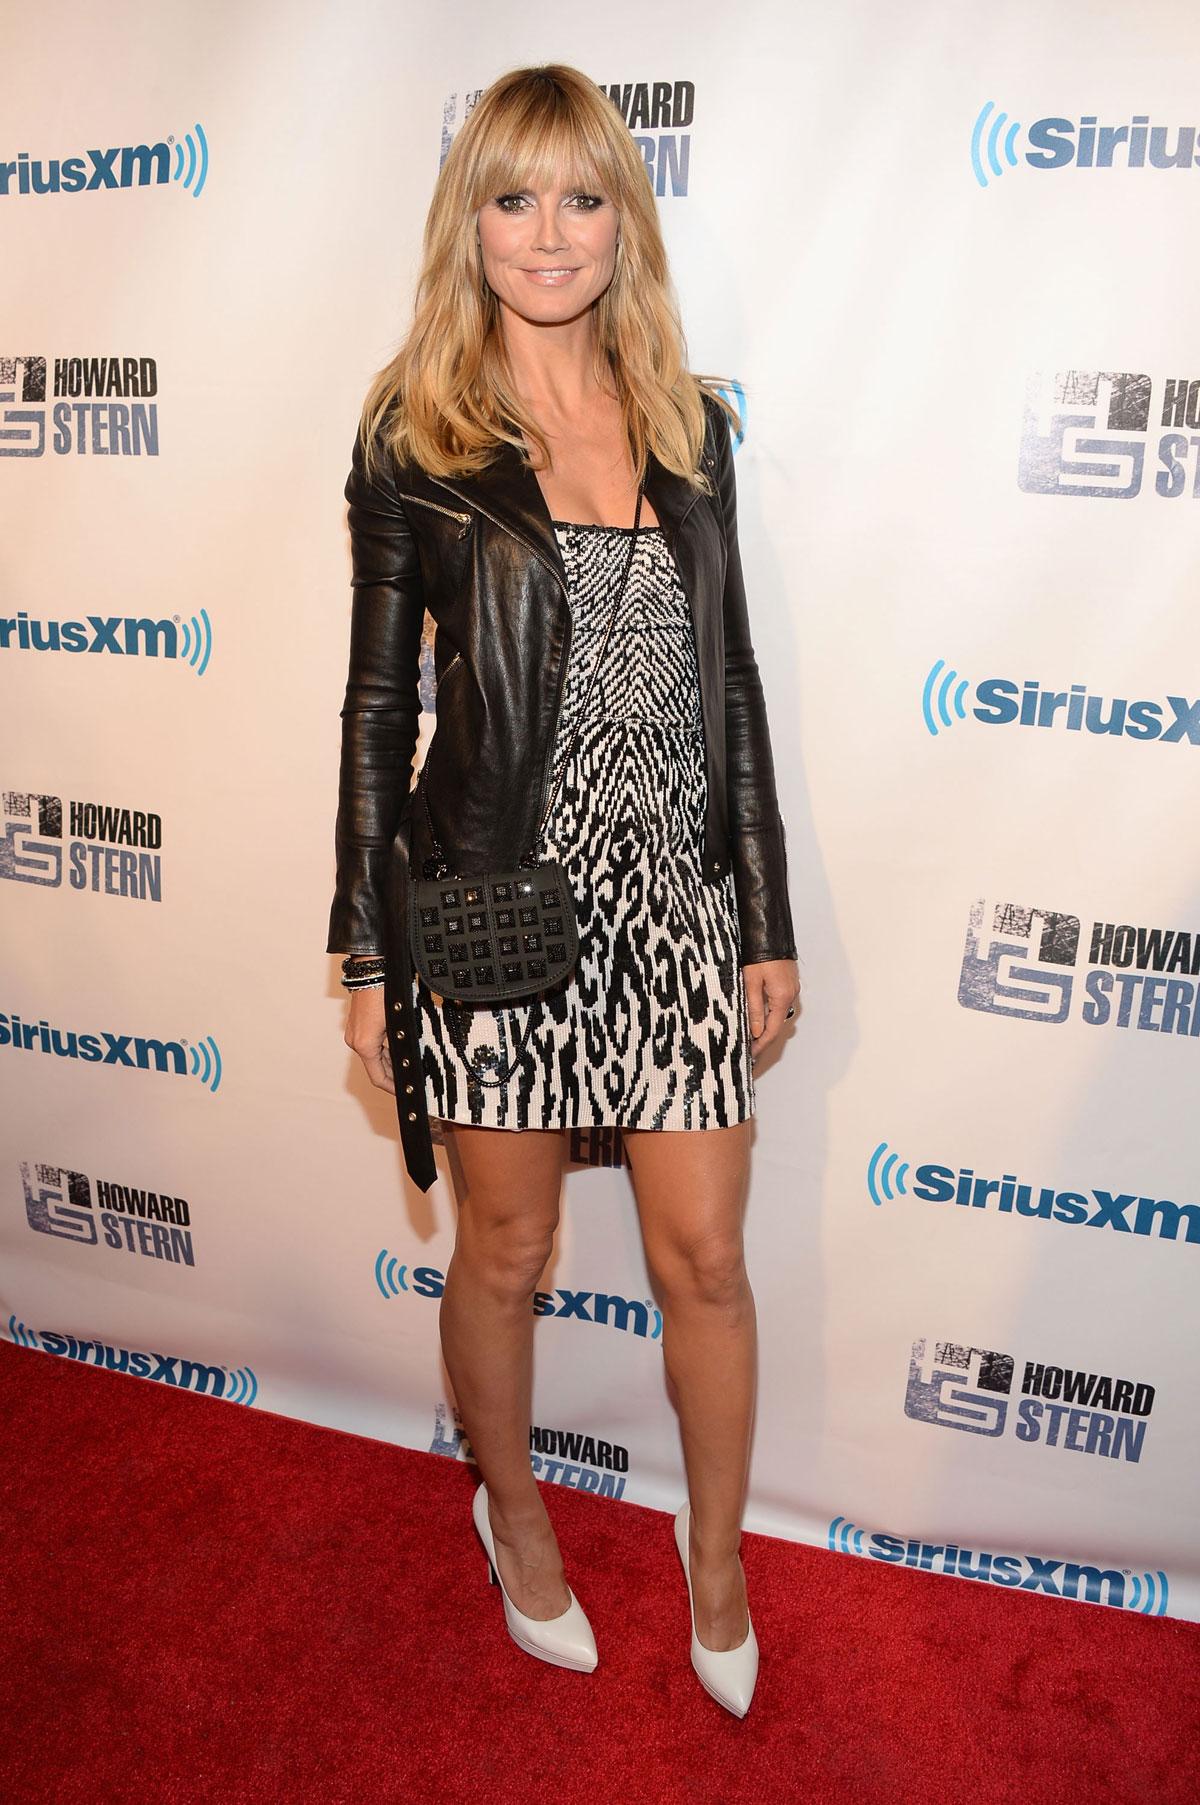 Heidi Klum at Howard Stern's birthday bash presented by SiriusXM